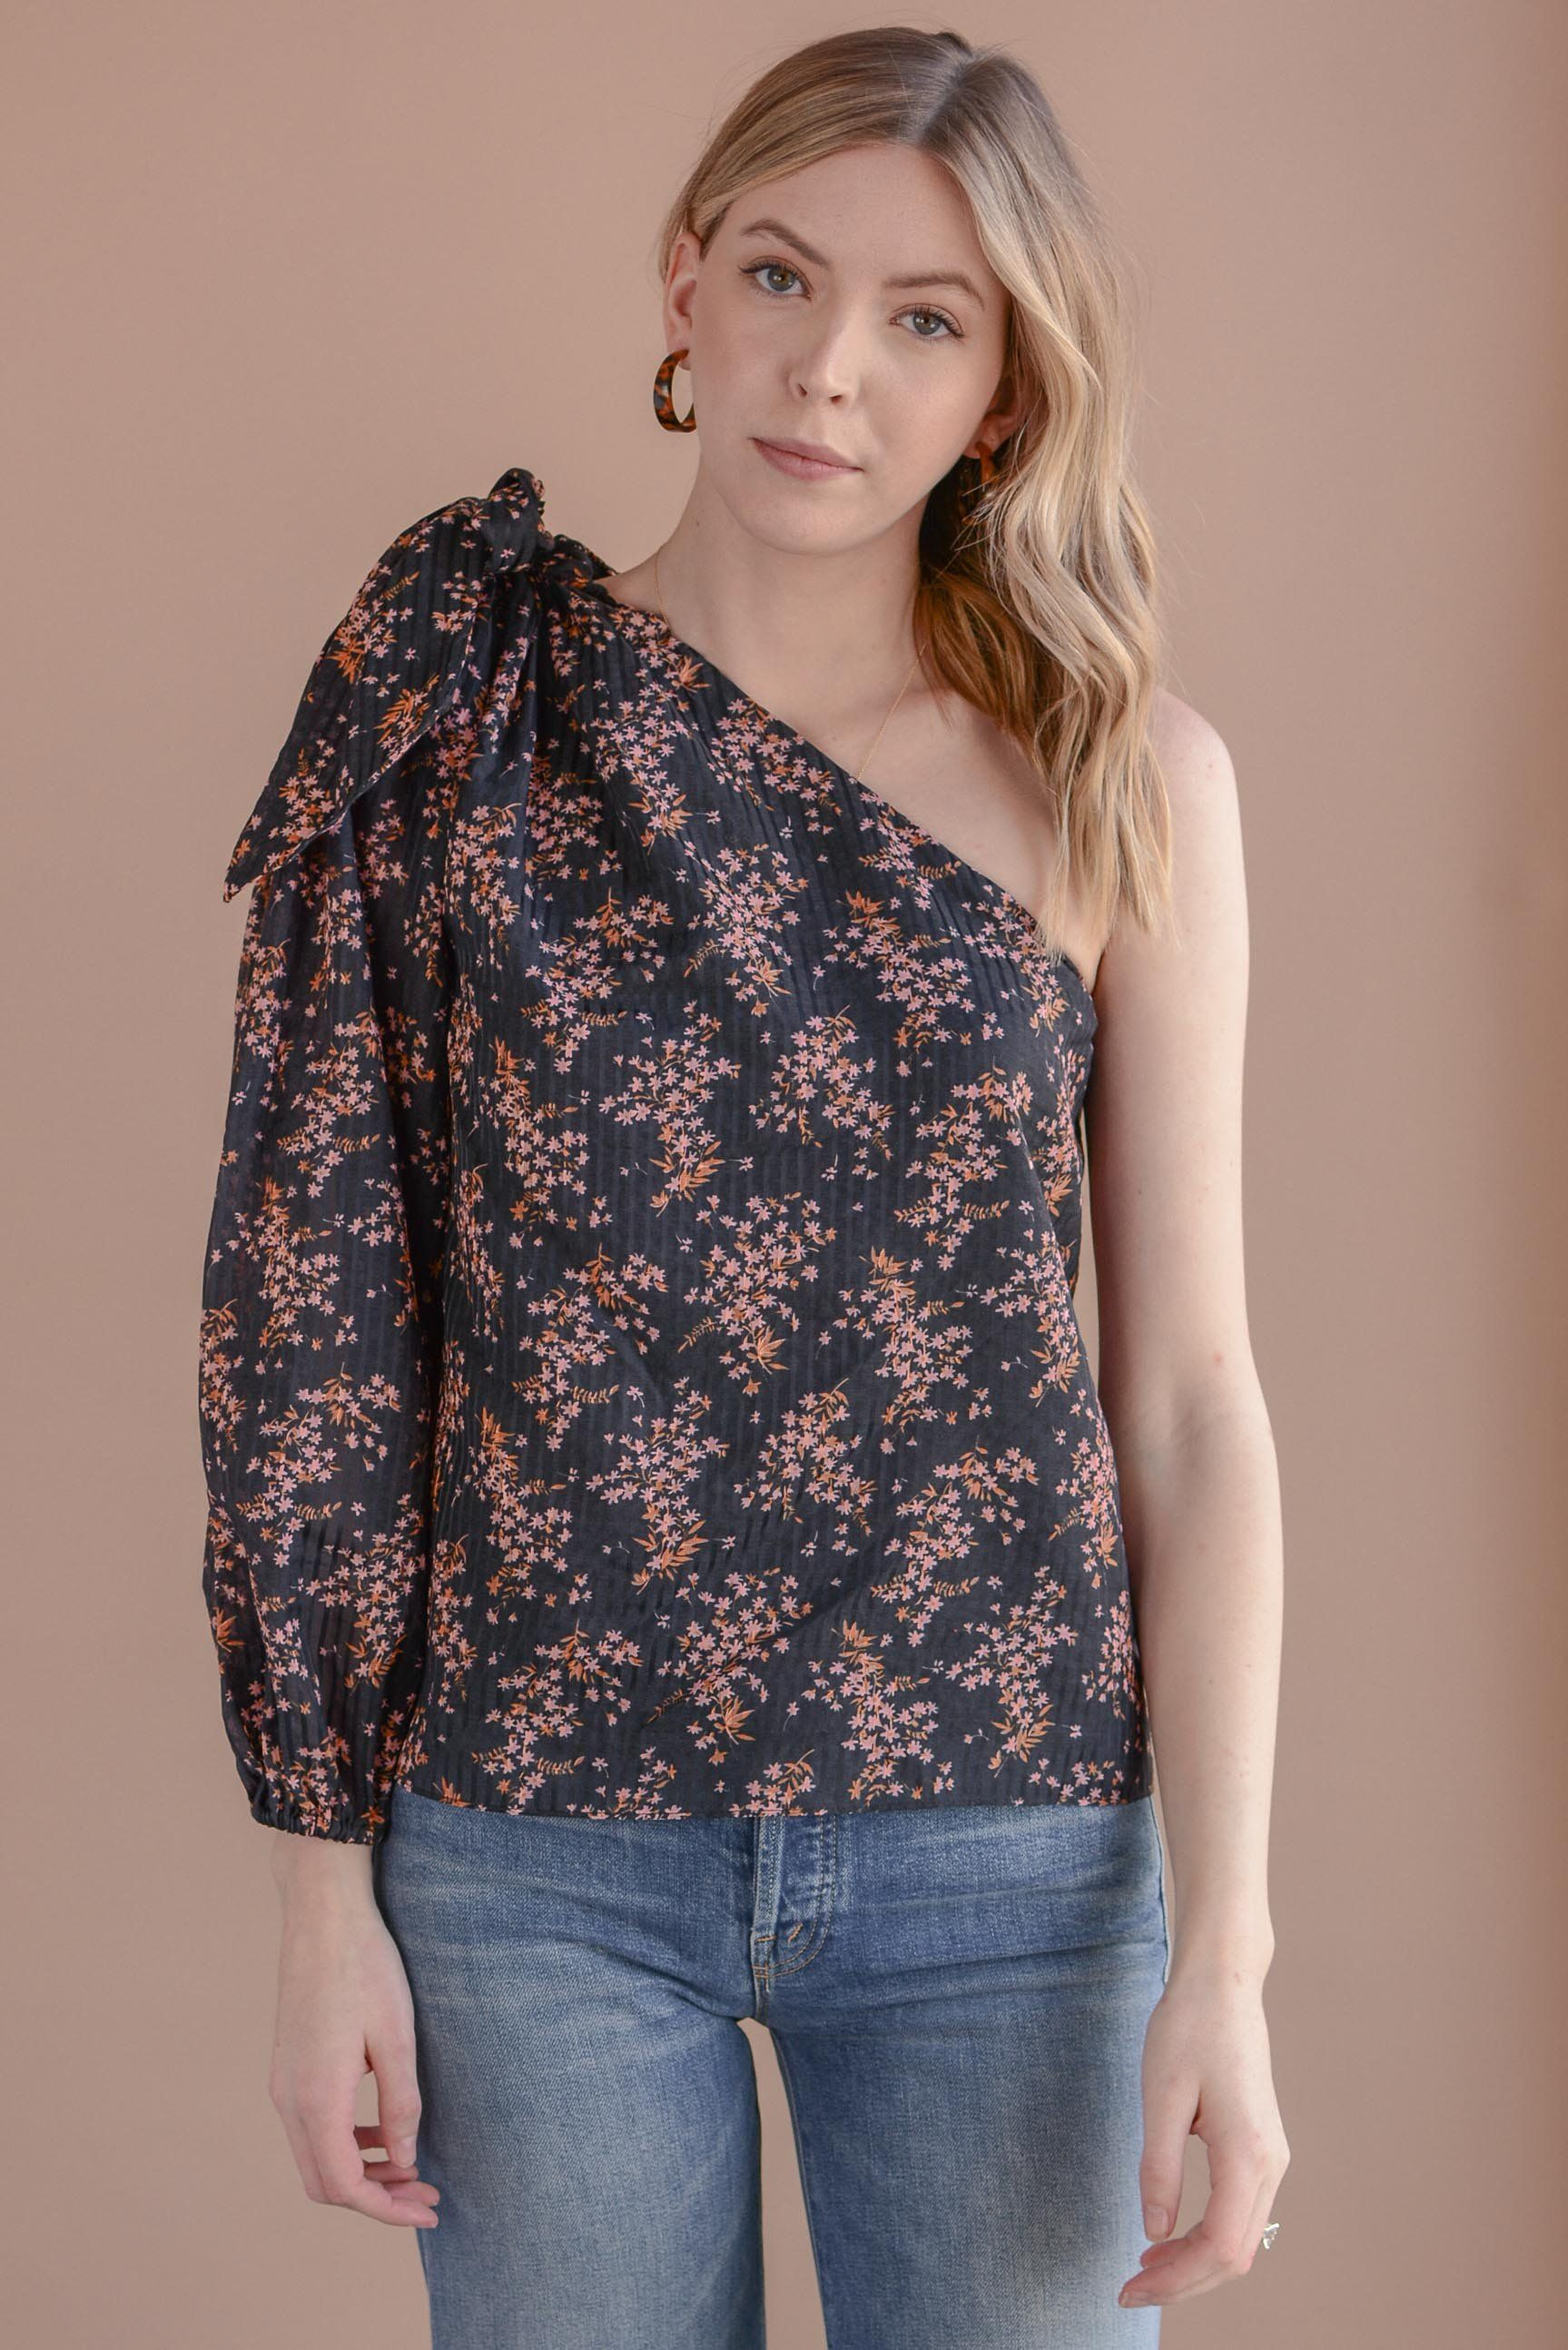 8e842603525 Flower Prints · Ulla Johnson Enid Blouse in Jet One Shoulder Tops, Ulla  Johnson, Cotton Silk,